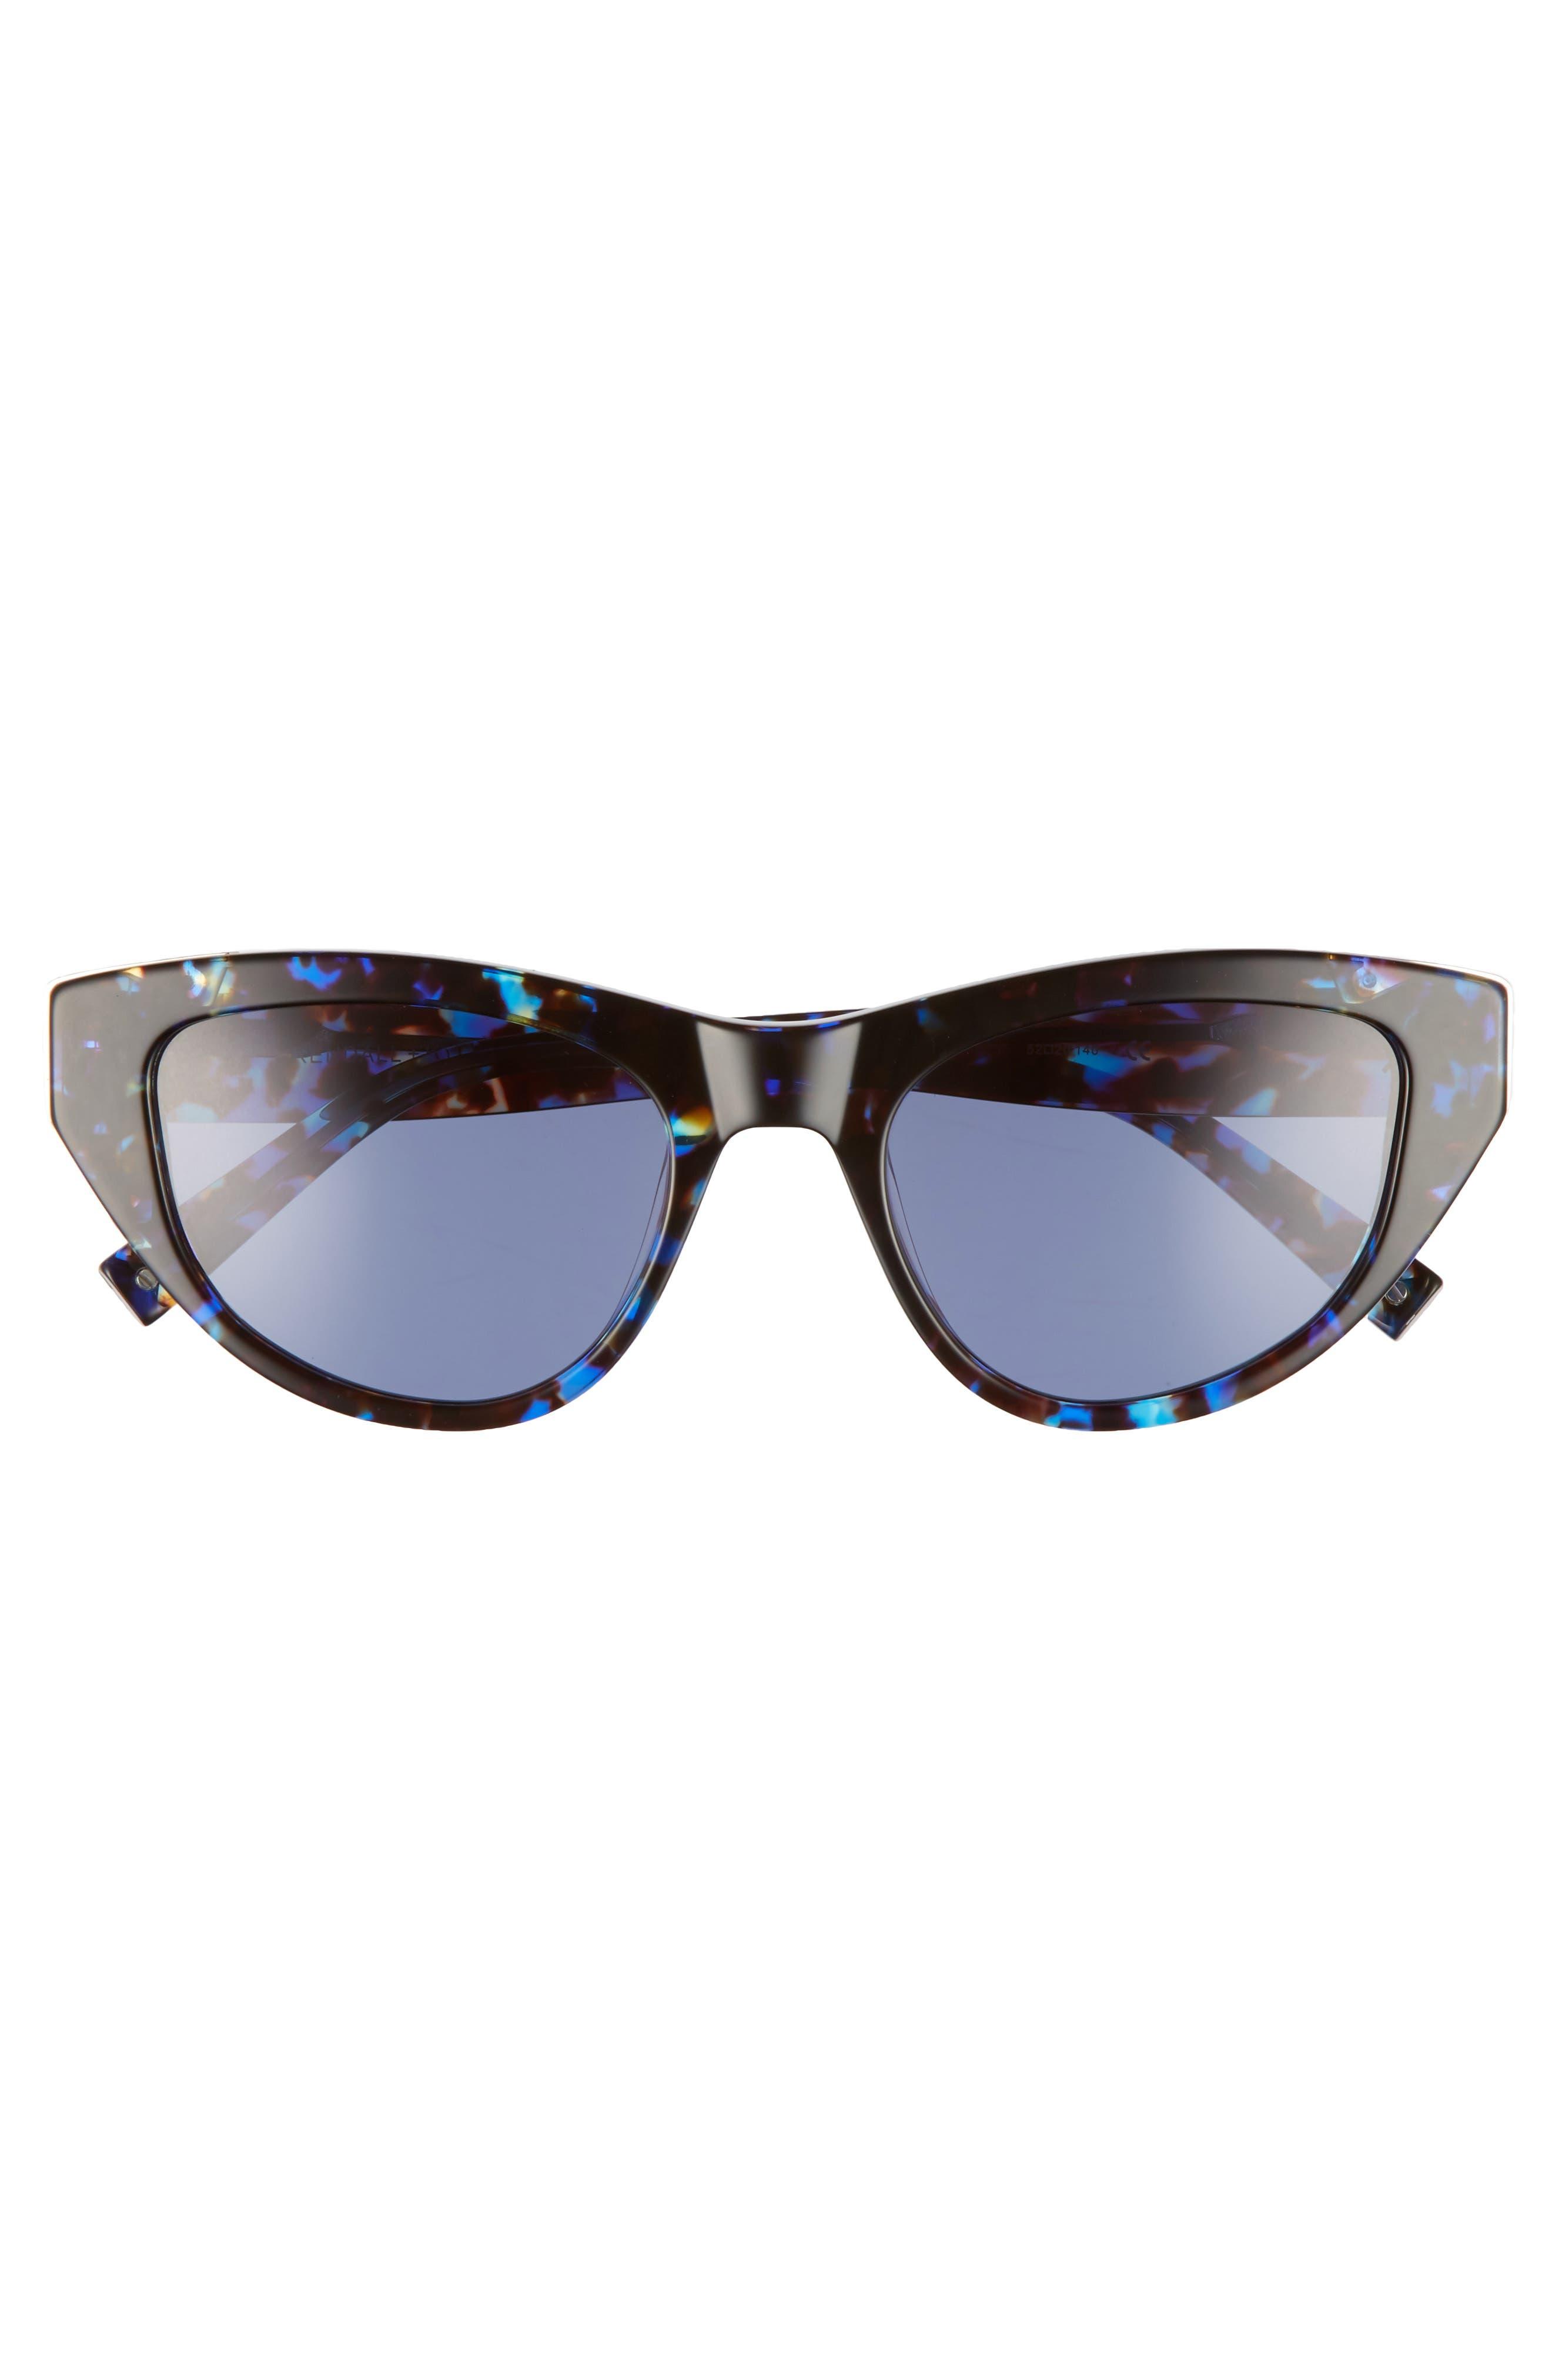 Sienna 52mm Retro Cat Eye Sunglasses,                             Alternate thumbnail 9, color,